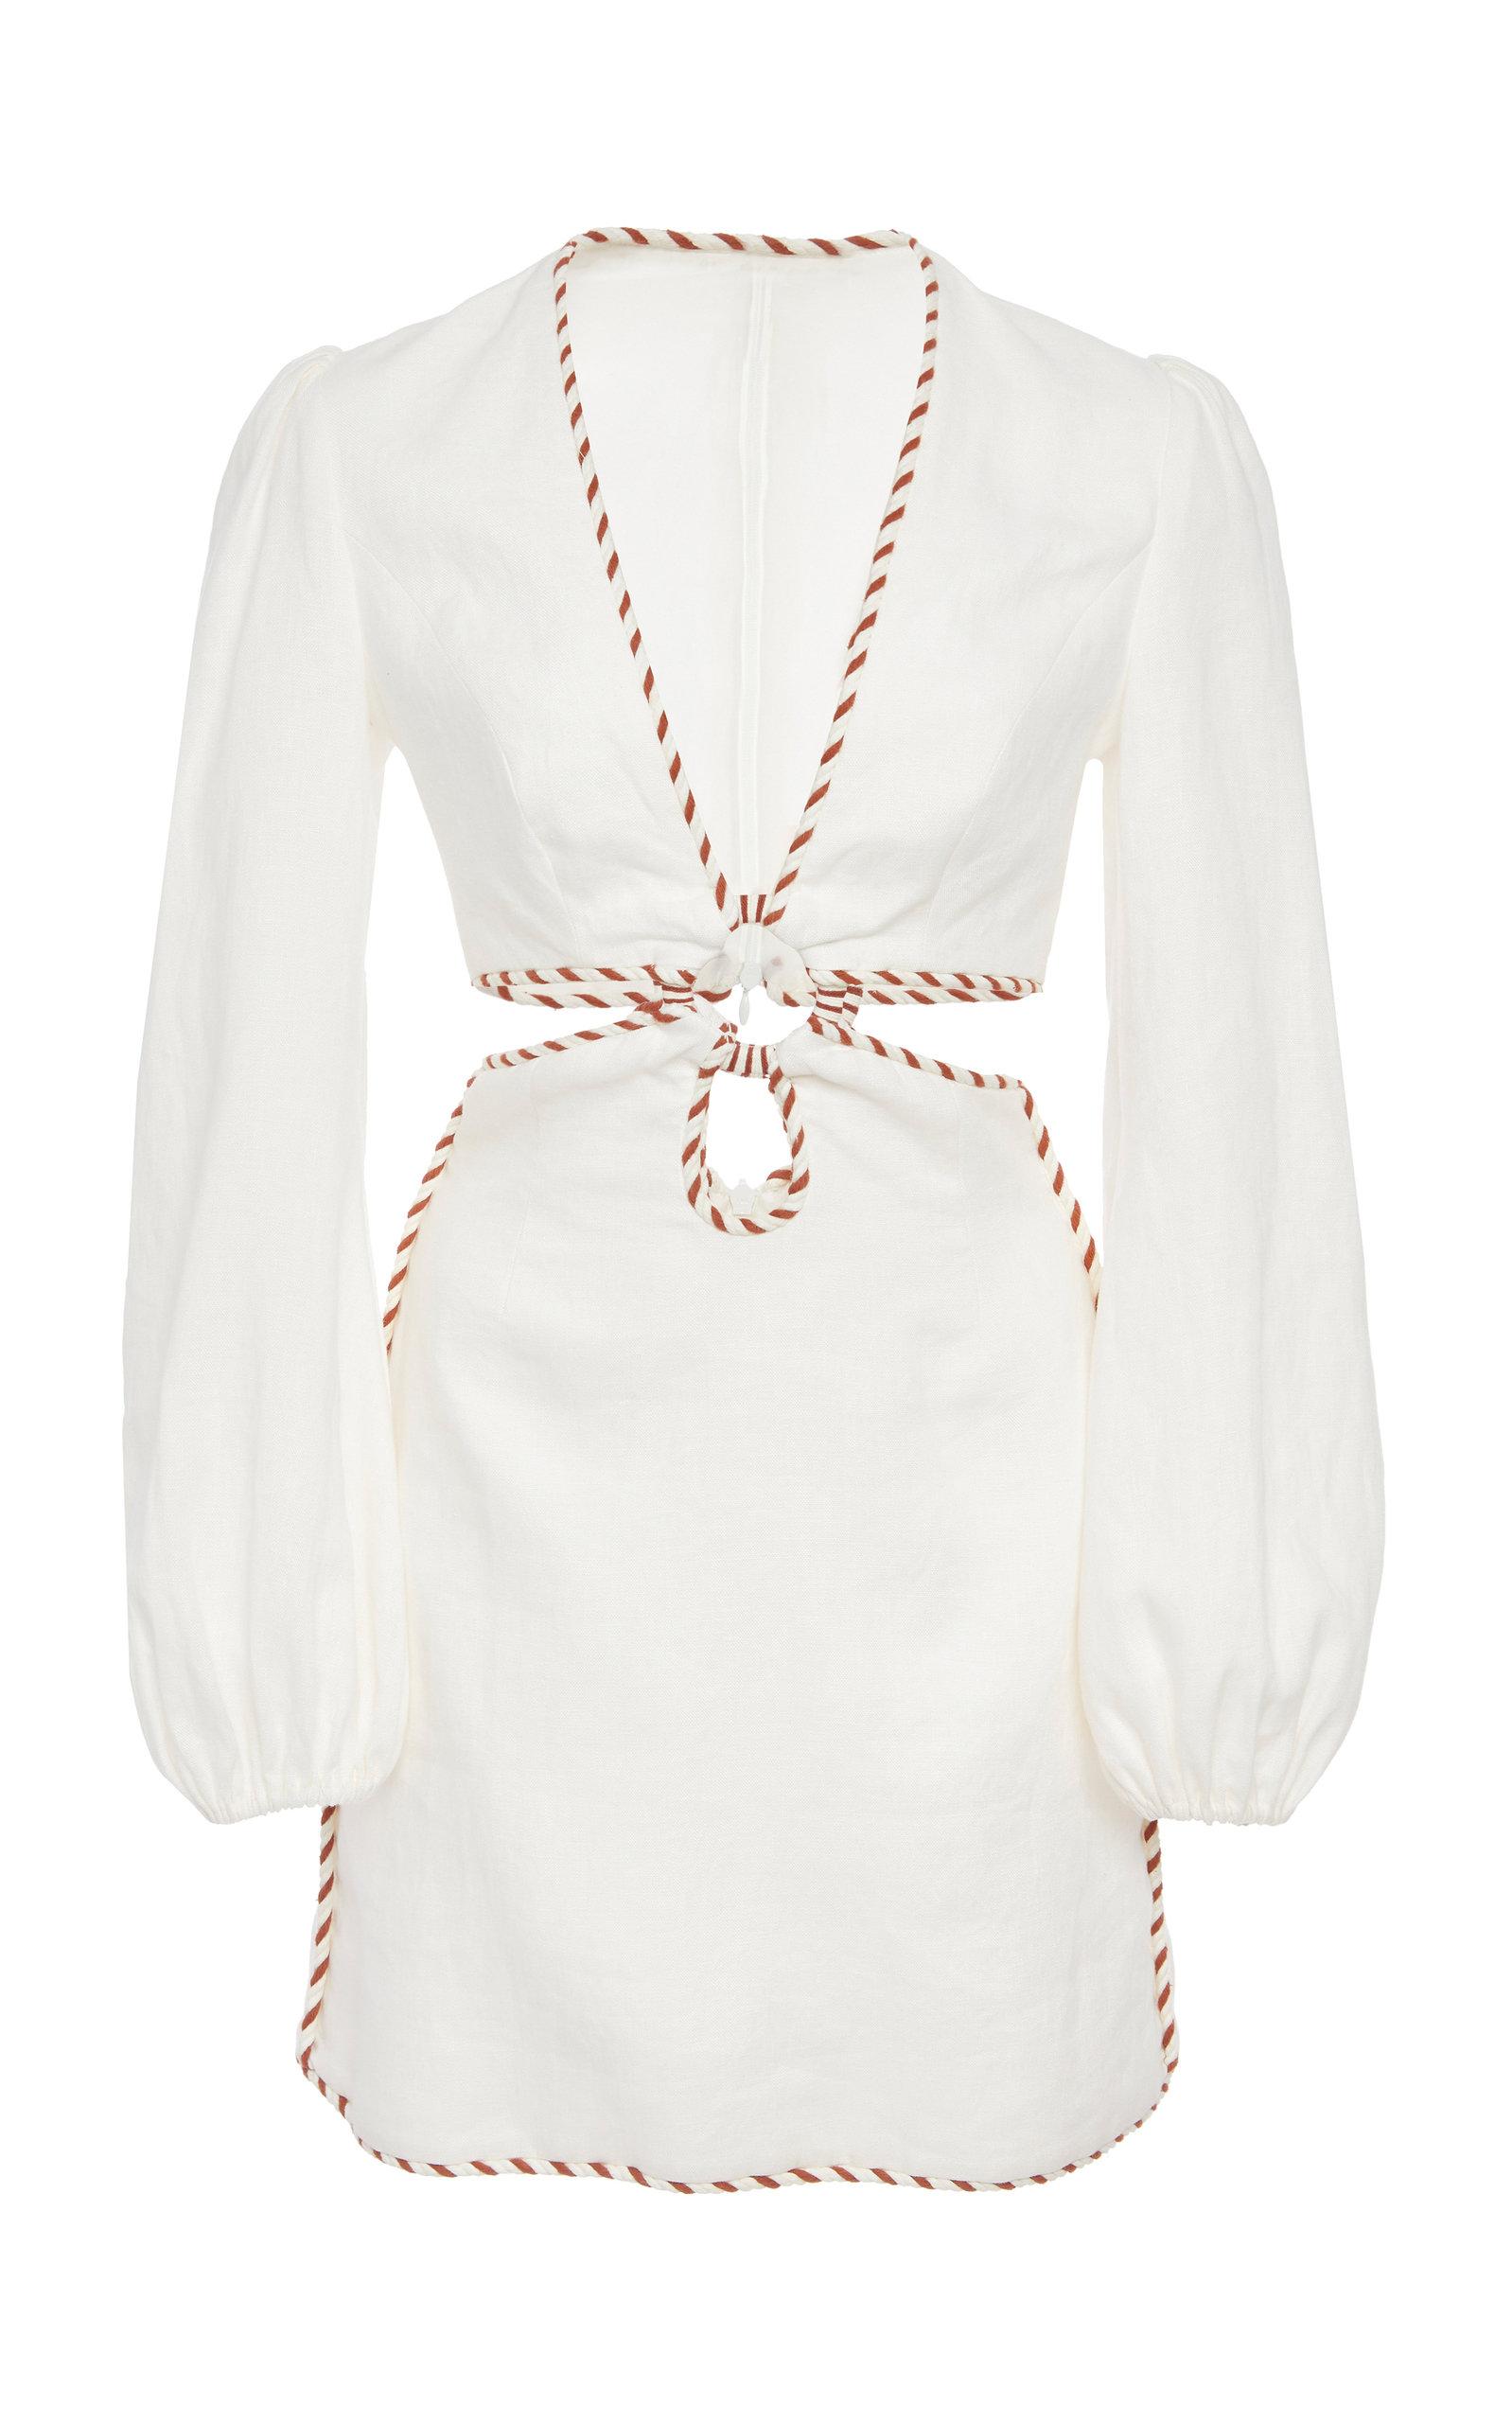 Corsage O-Ring Cutout Mini Dress W/ Braided Trim in White